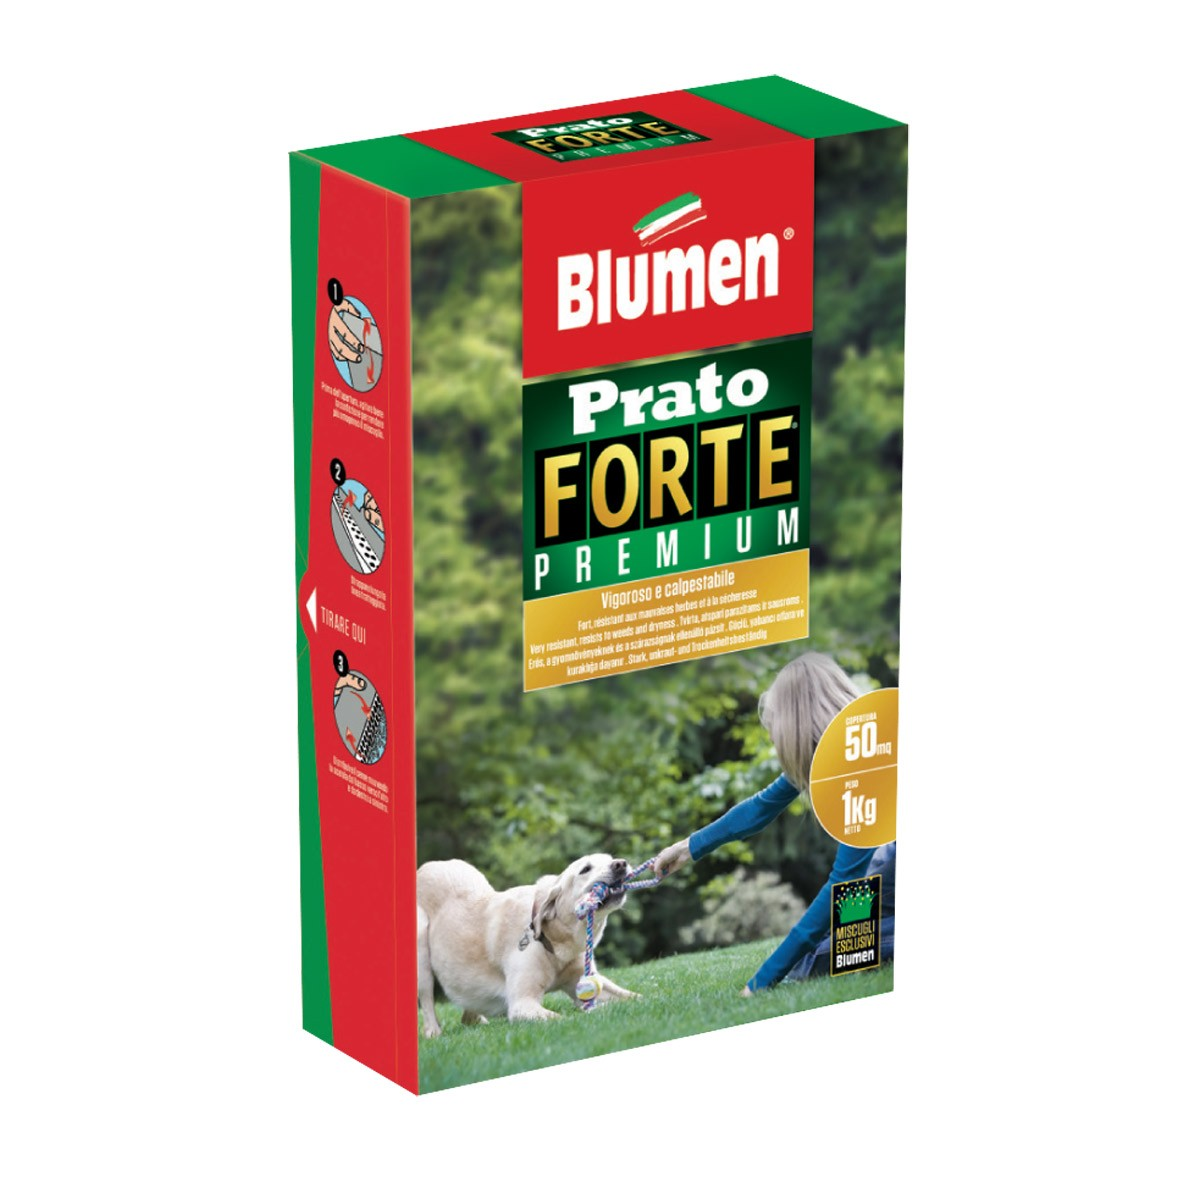 Prato Forte Premium